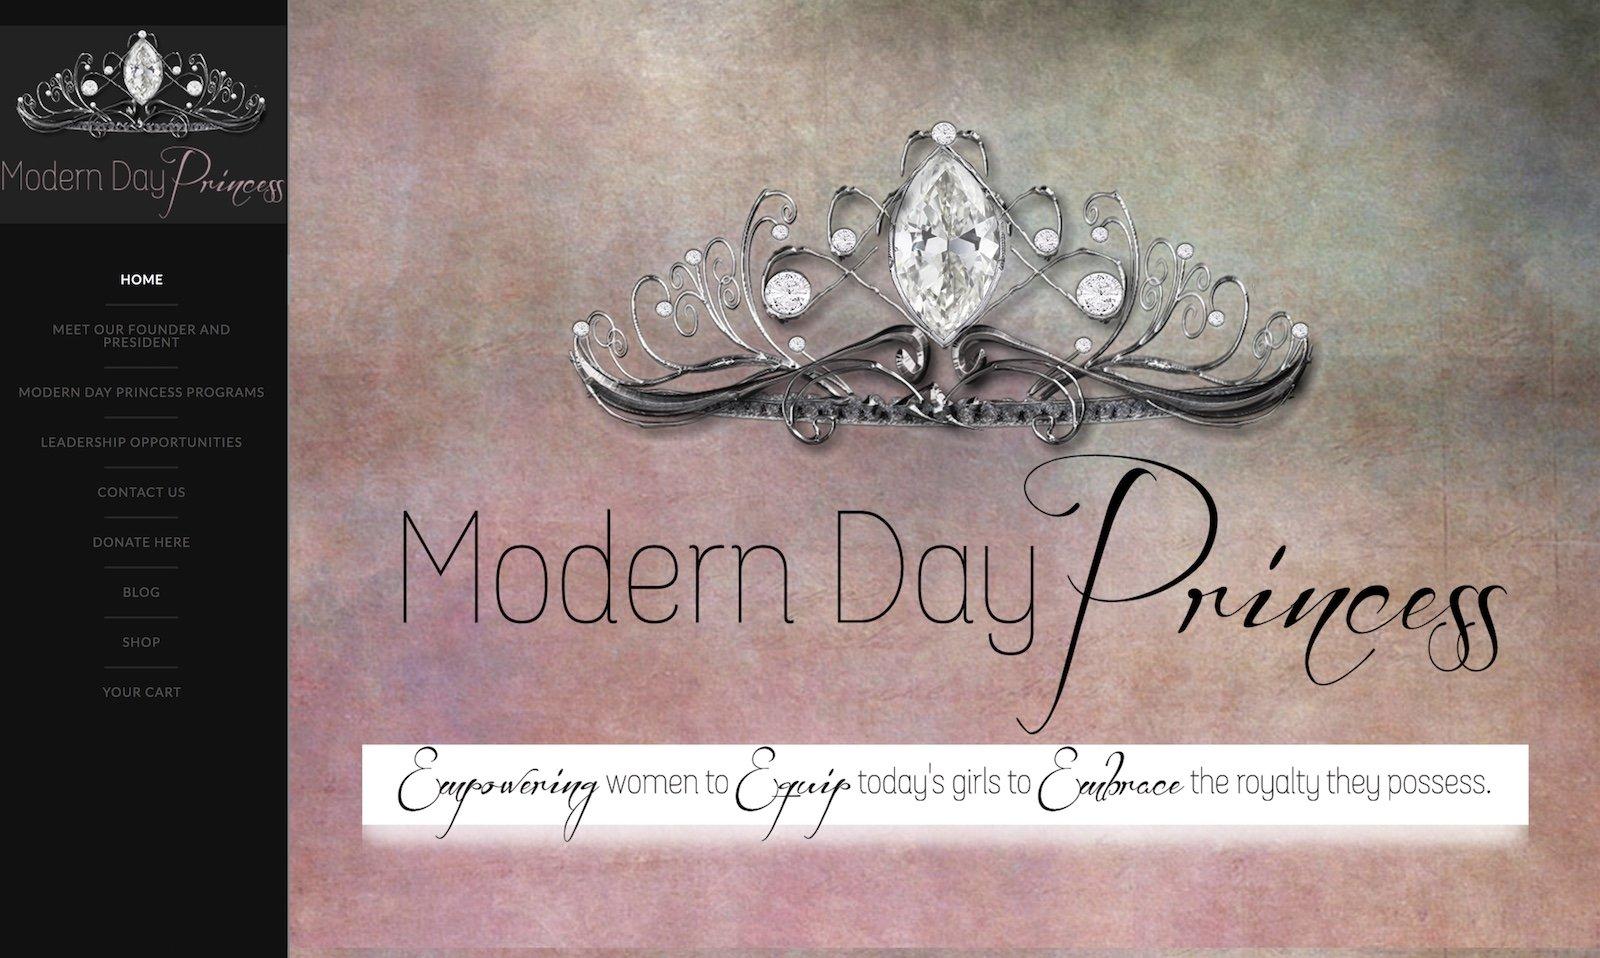 Modern Day Princess